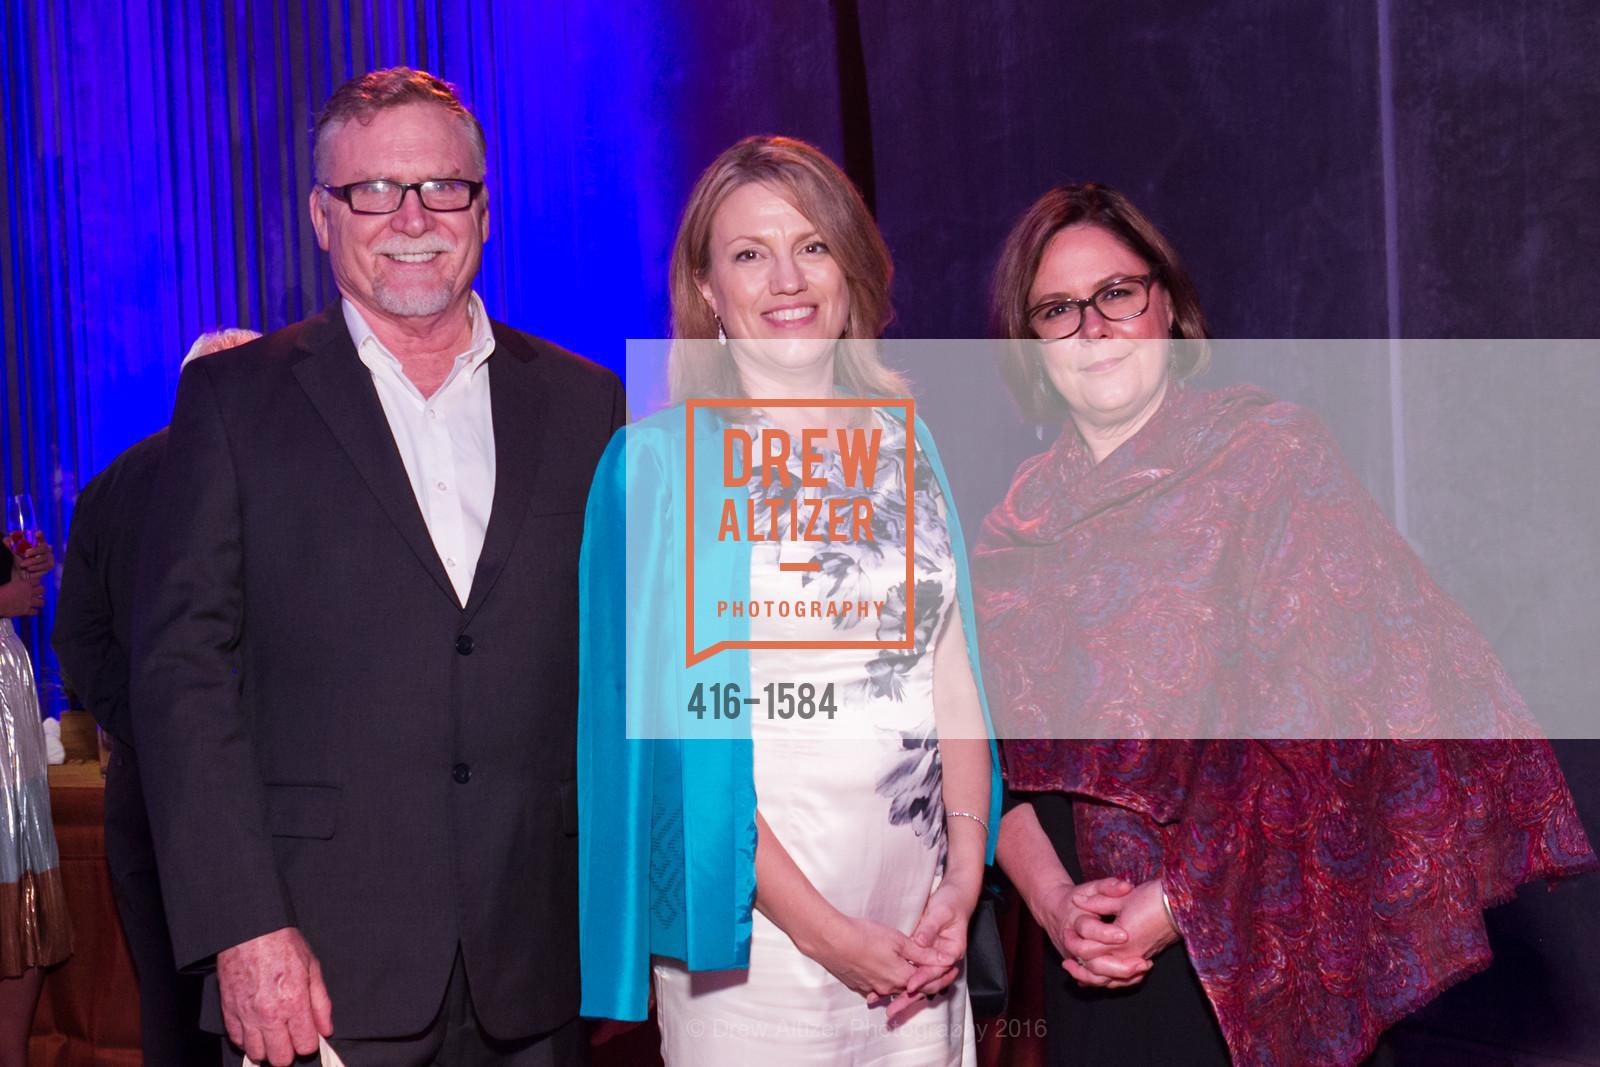 Jim Swanson, Lisa Mealoy, Christina Swanson, Director's Debut, Manetti Shrem Museum of Art. Old Davis Road at Alumni Lane, November 12th, 2016